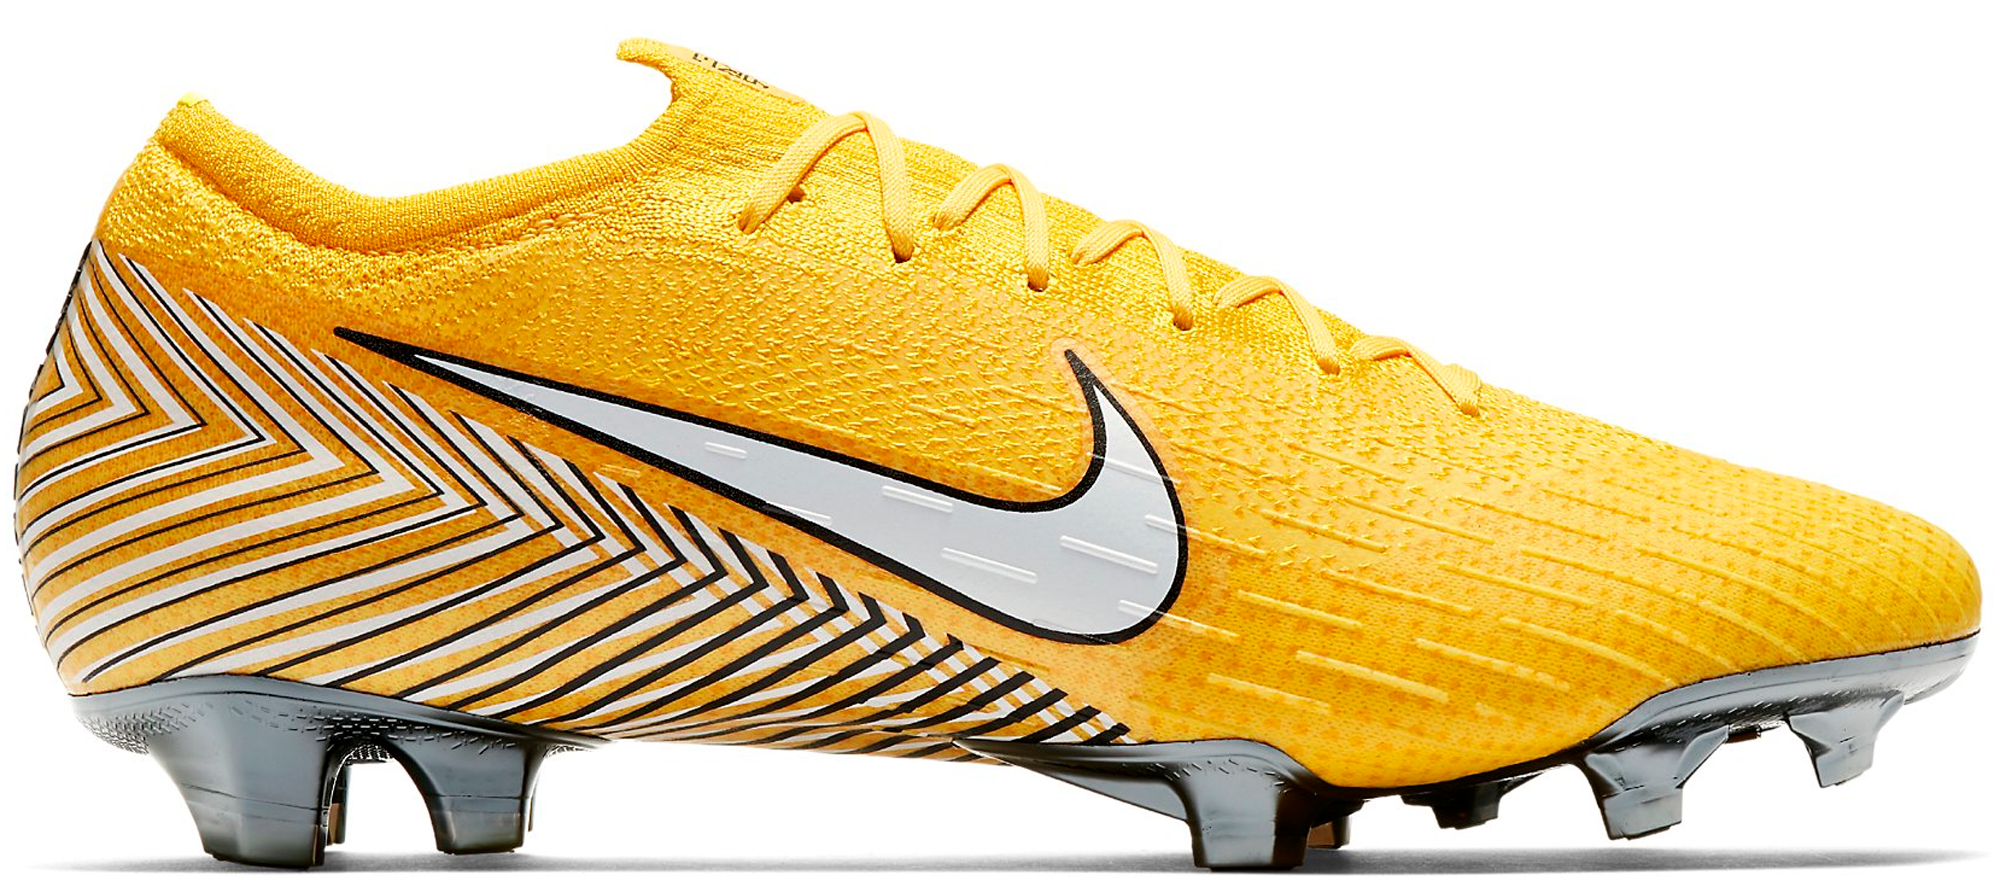 Nike Mercurial Vapor 360 Cleat Neymar